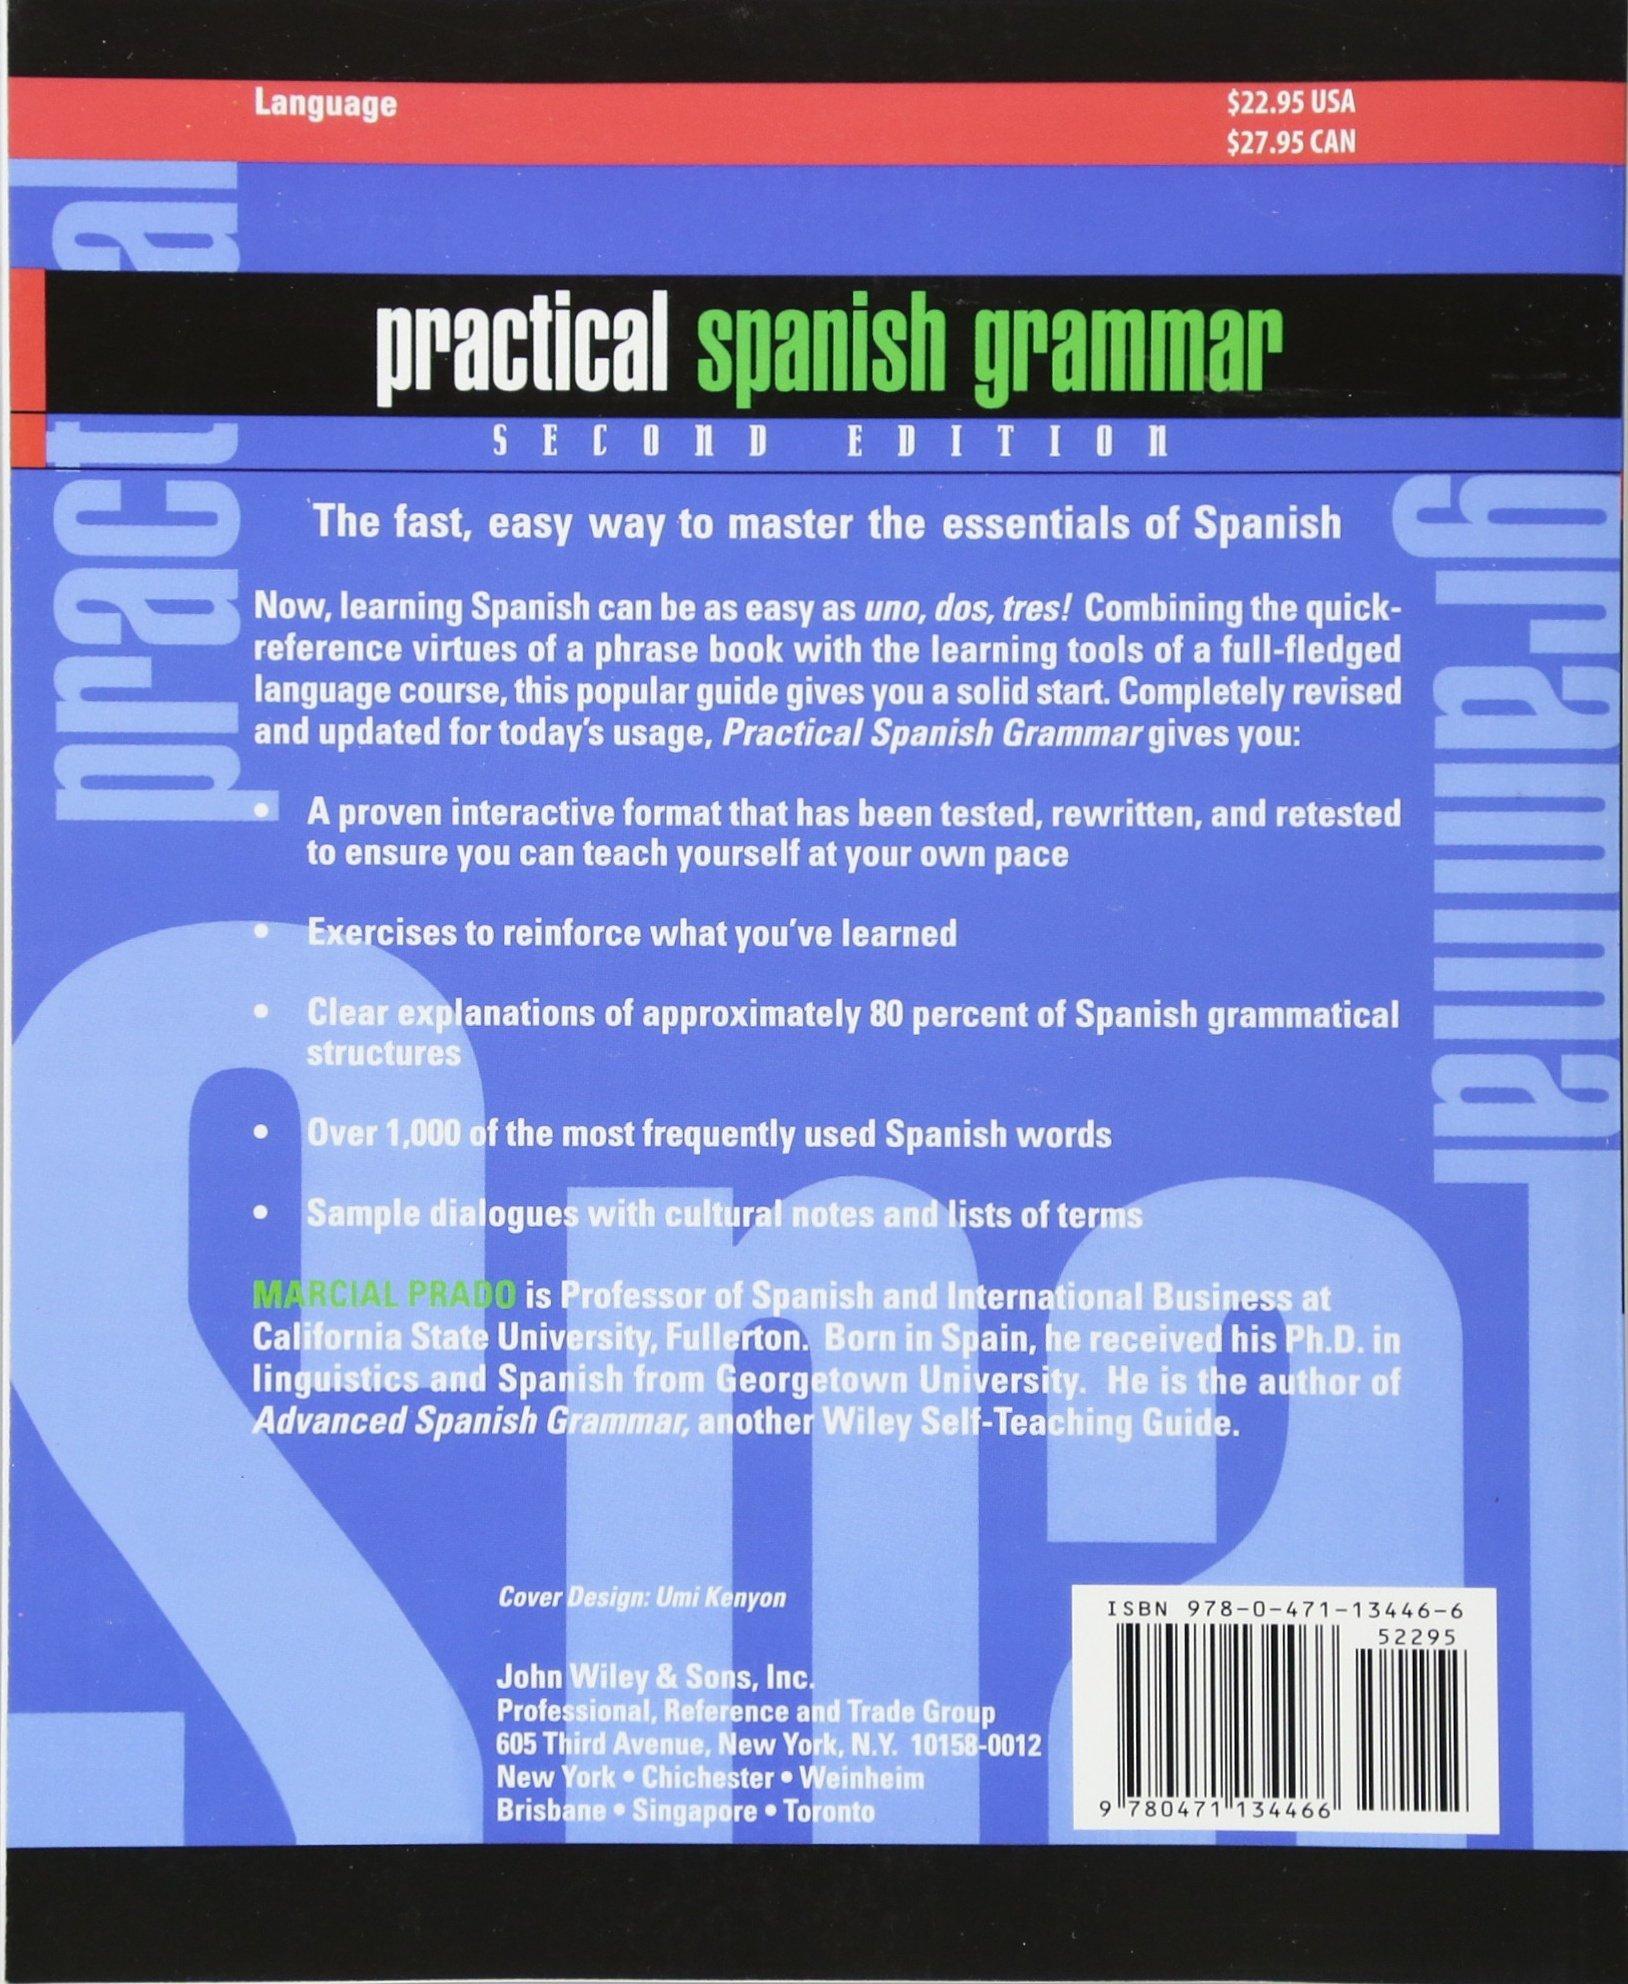 Practical Spanish Grammar: A Self-Teaching Guide, 2nd Edition: Amazon.de:  Marcial Prado: Fremdsprachige Bücher